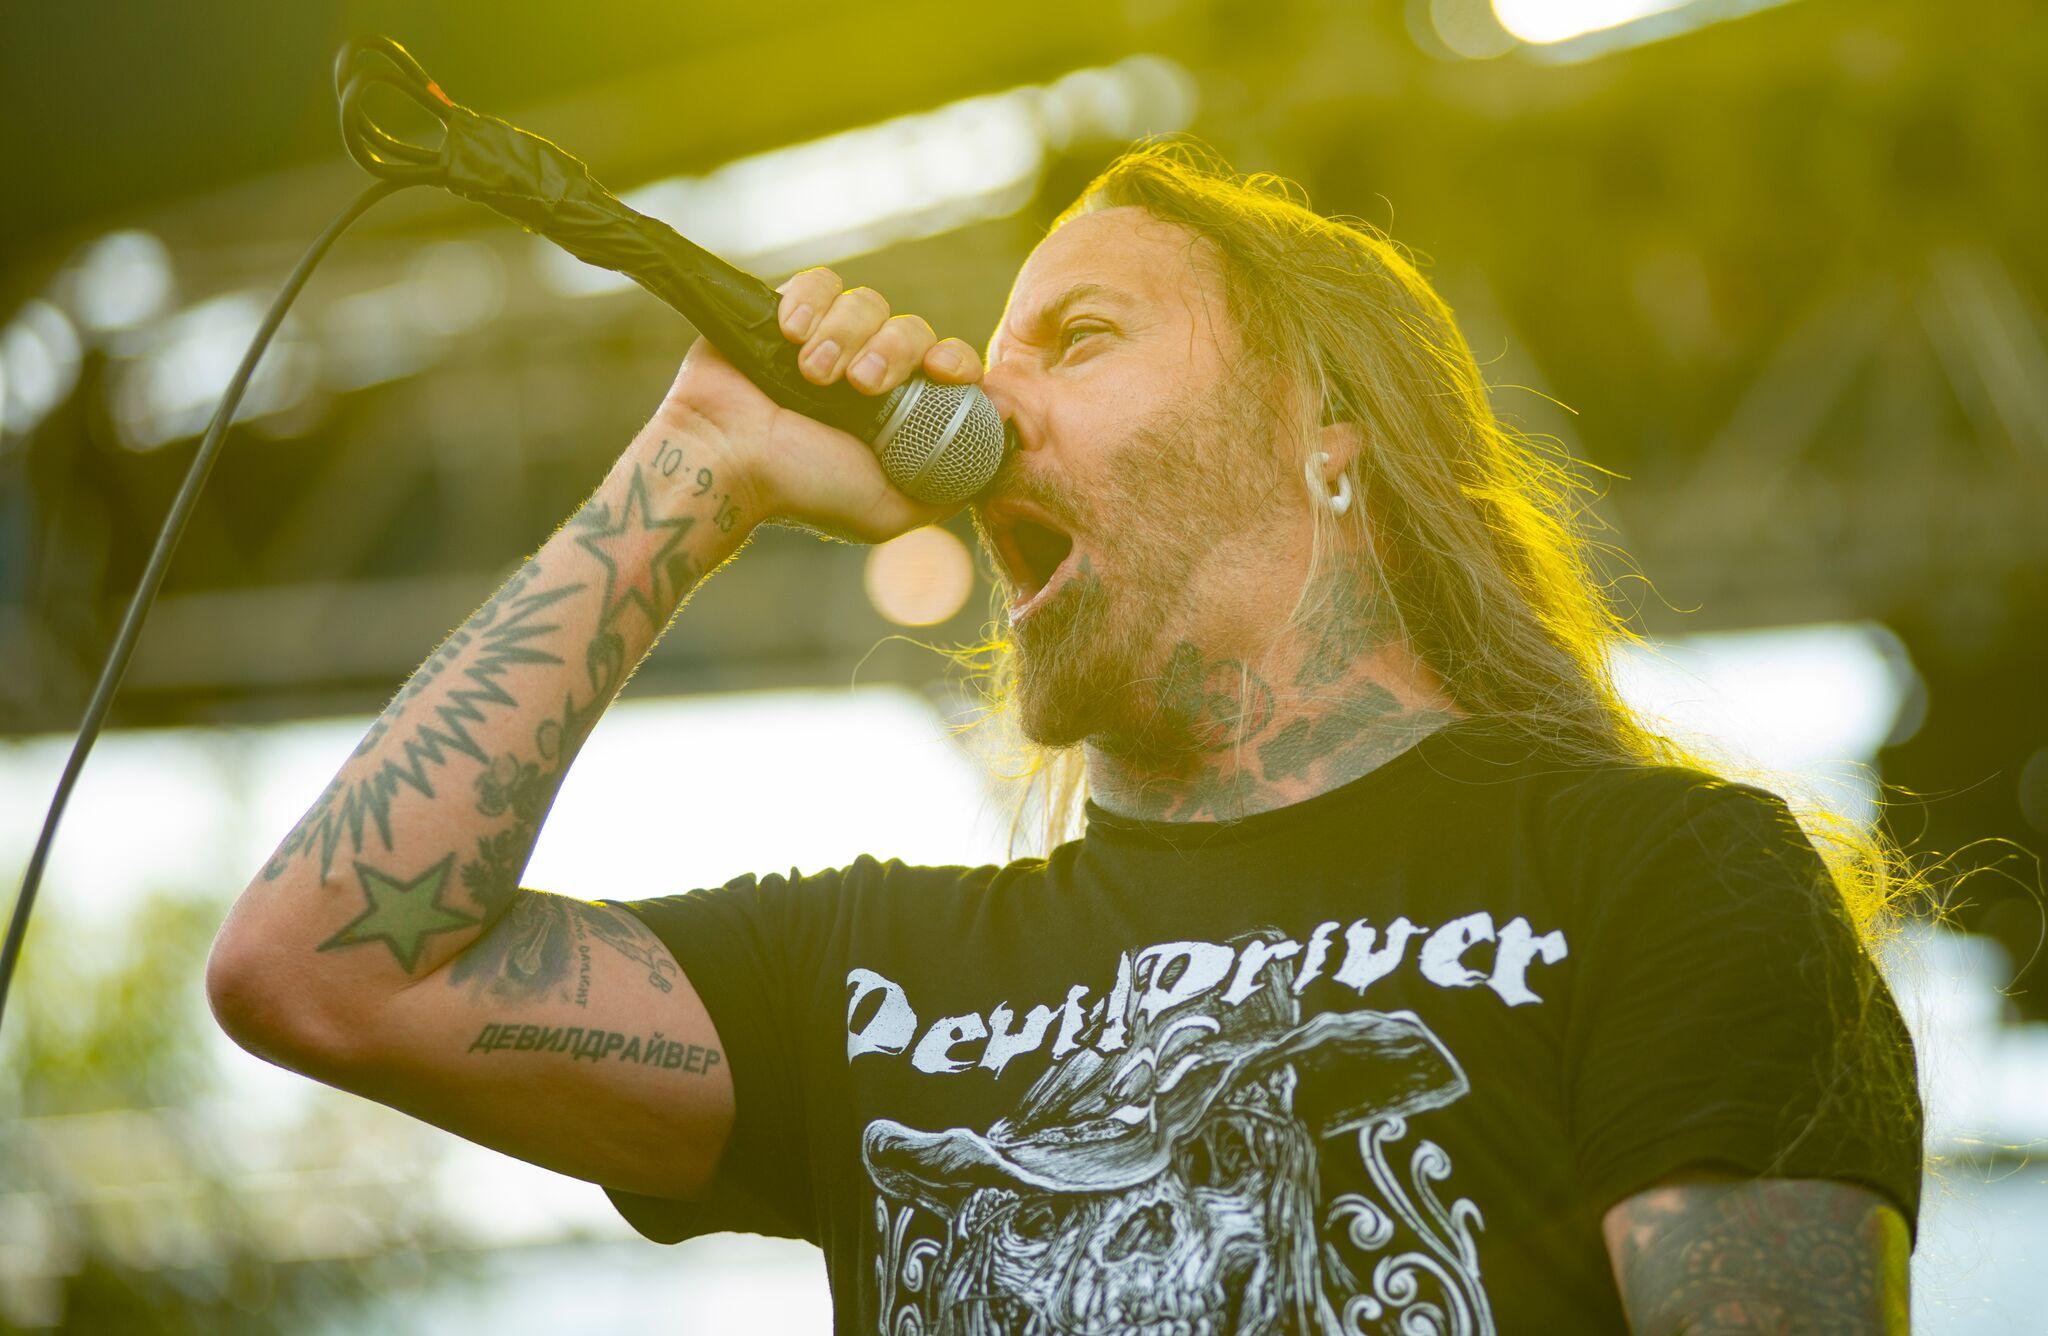 DevilDriver at Inkcarceration Festival July 15th 2018